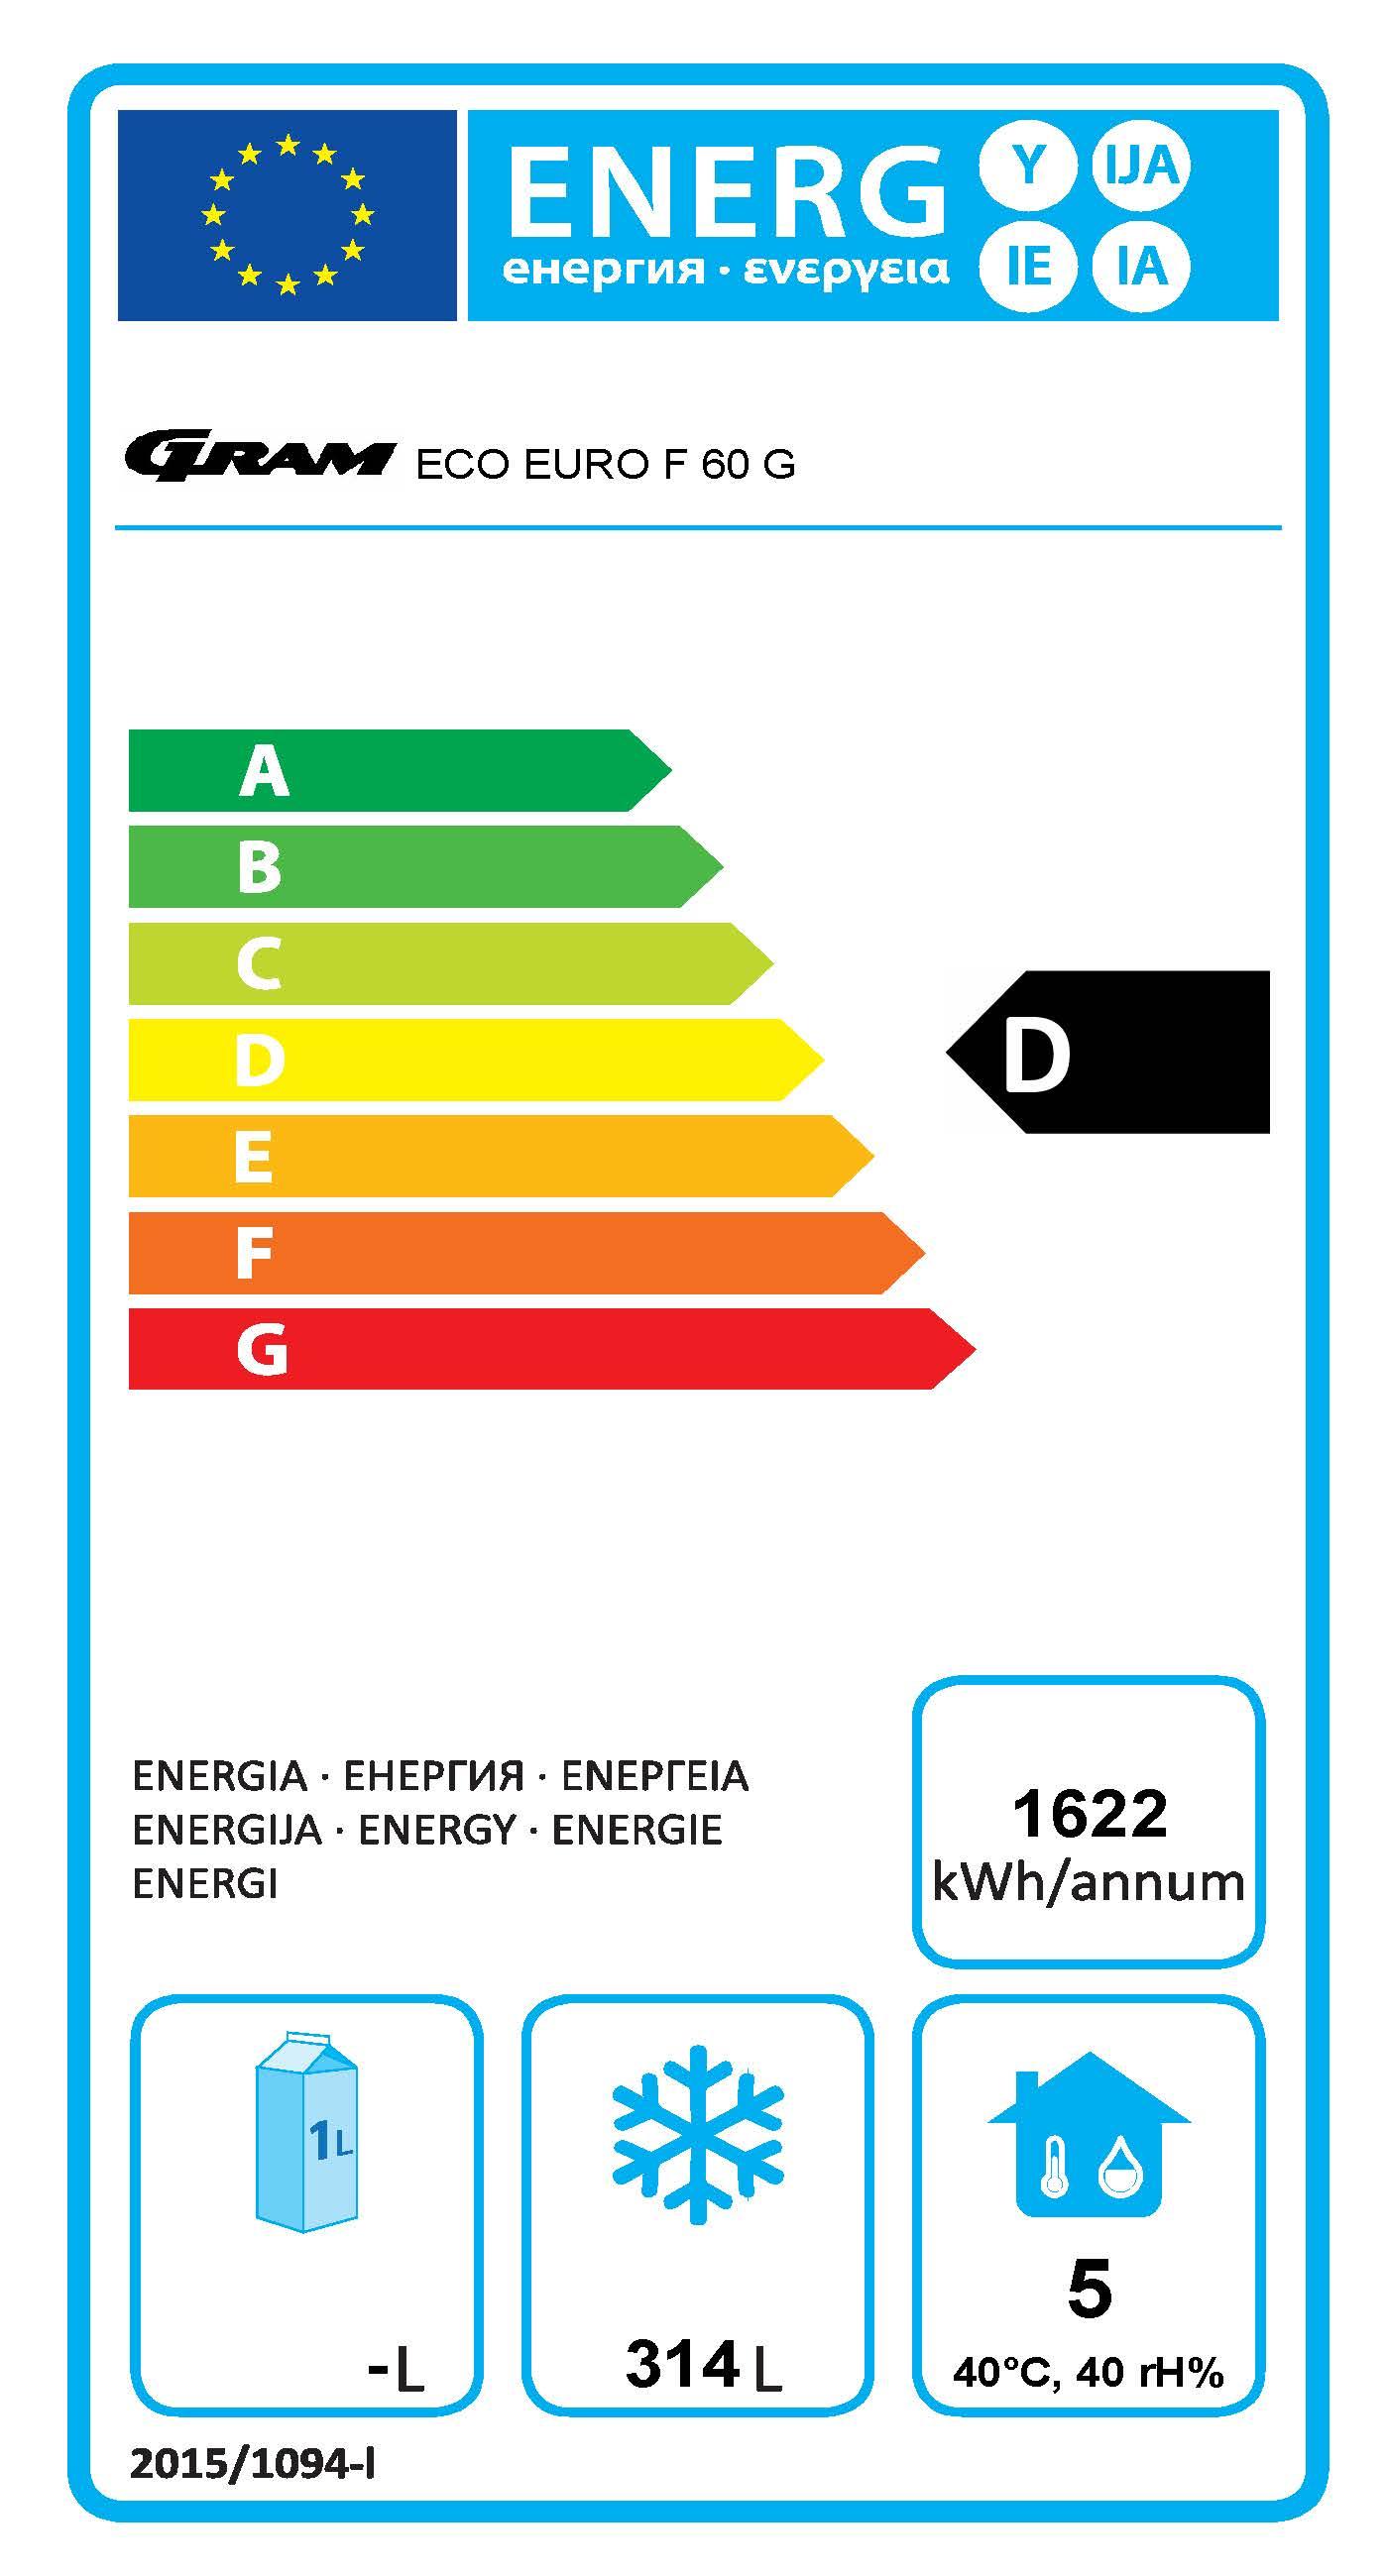 ECO EURO F 60 BAG C1 4N 465 Ltr Upright Freezer Energy Rating